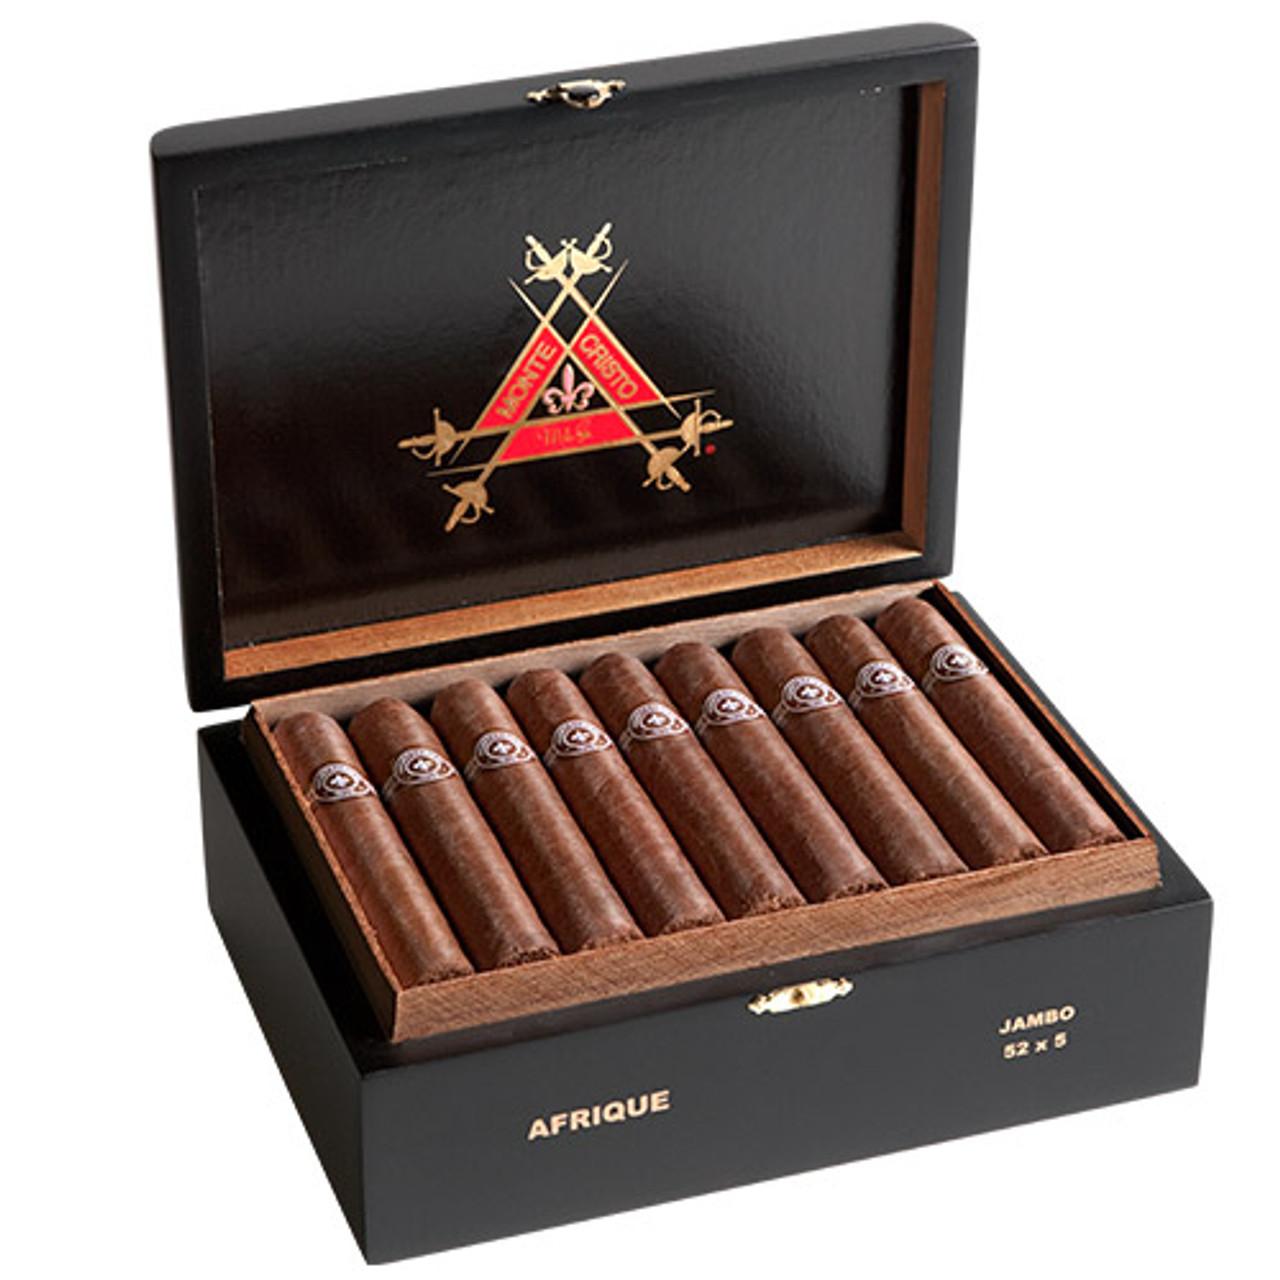 Montecristo Afrique Jambo - 5 x 52 Cigars (Box of 15)